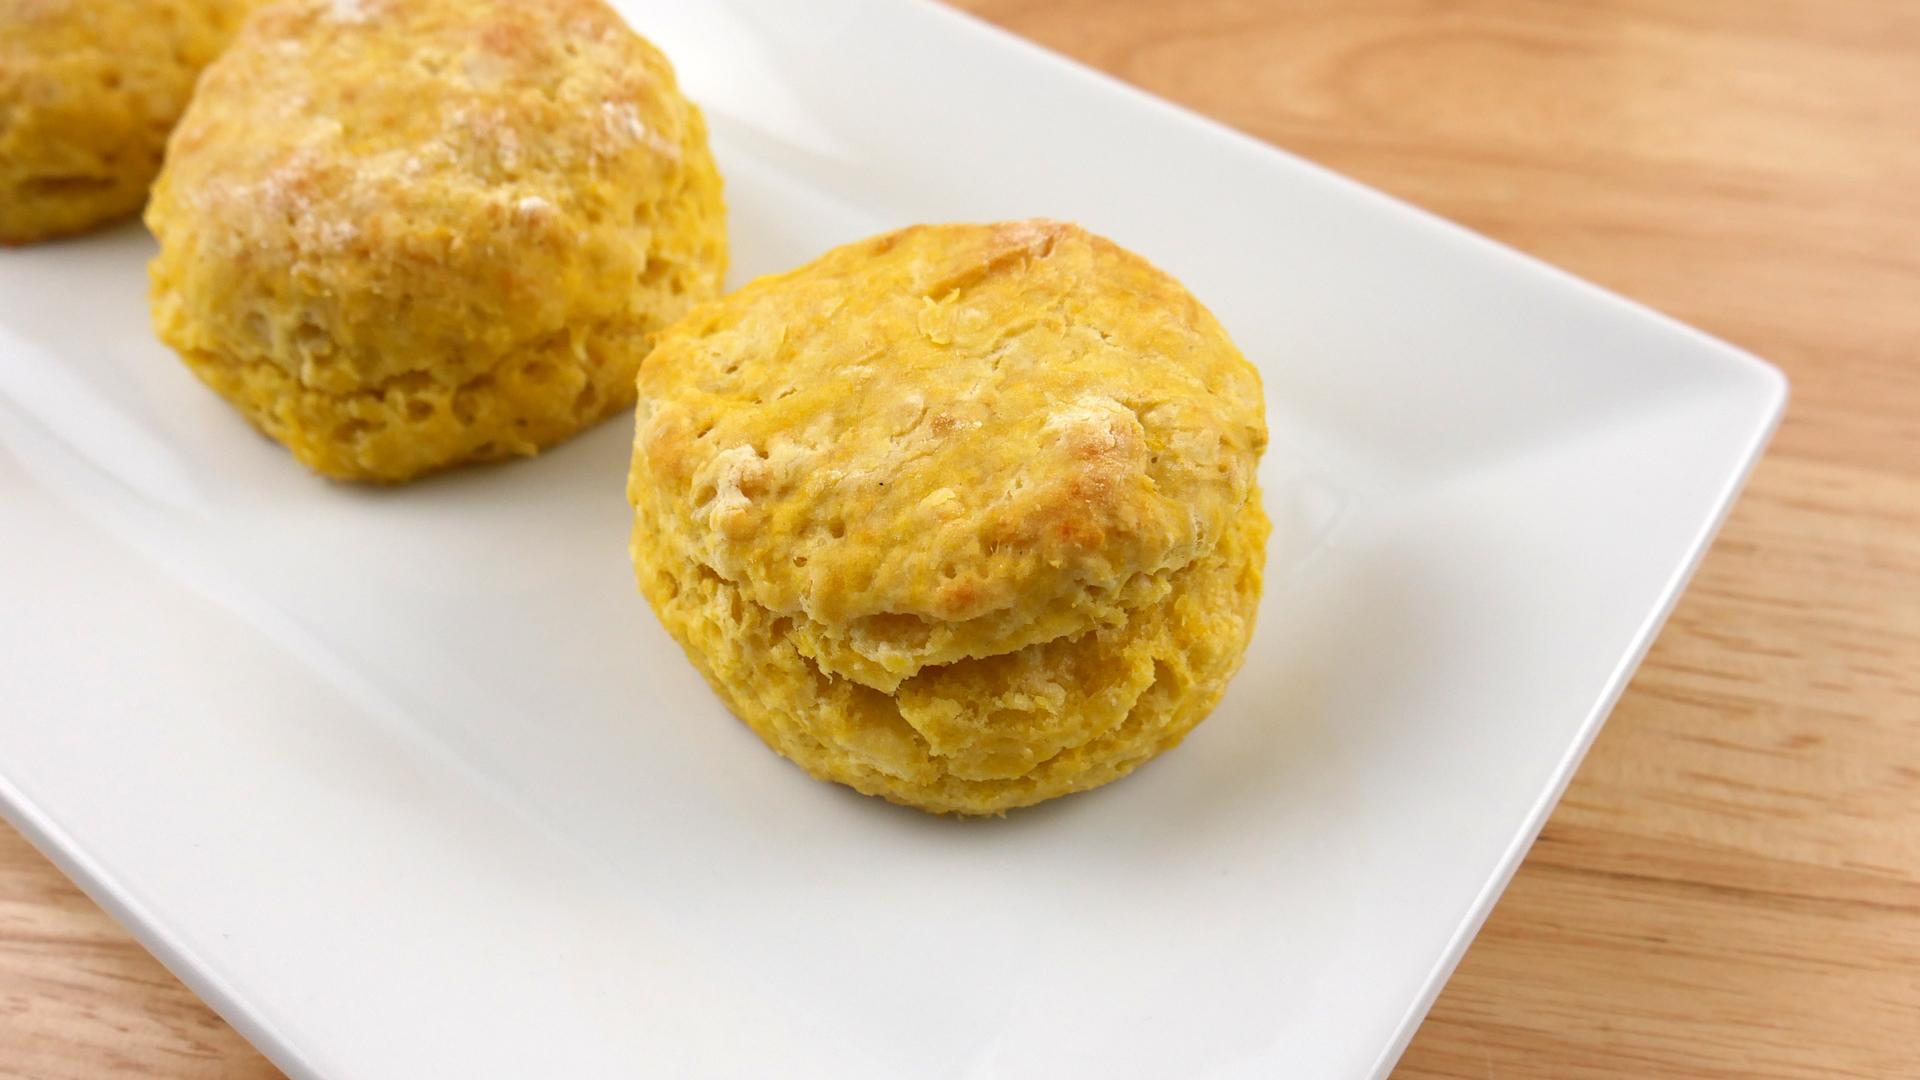 Pãezinhos de Abóbora (Pumpkin Biscuits)